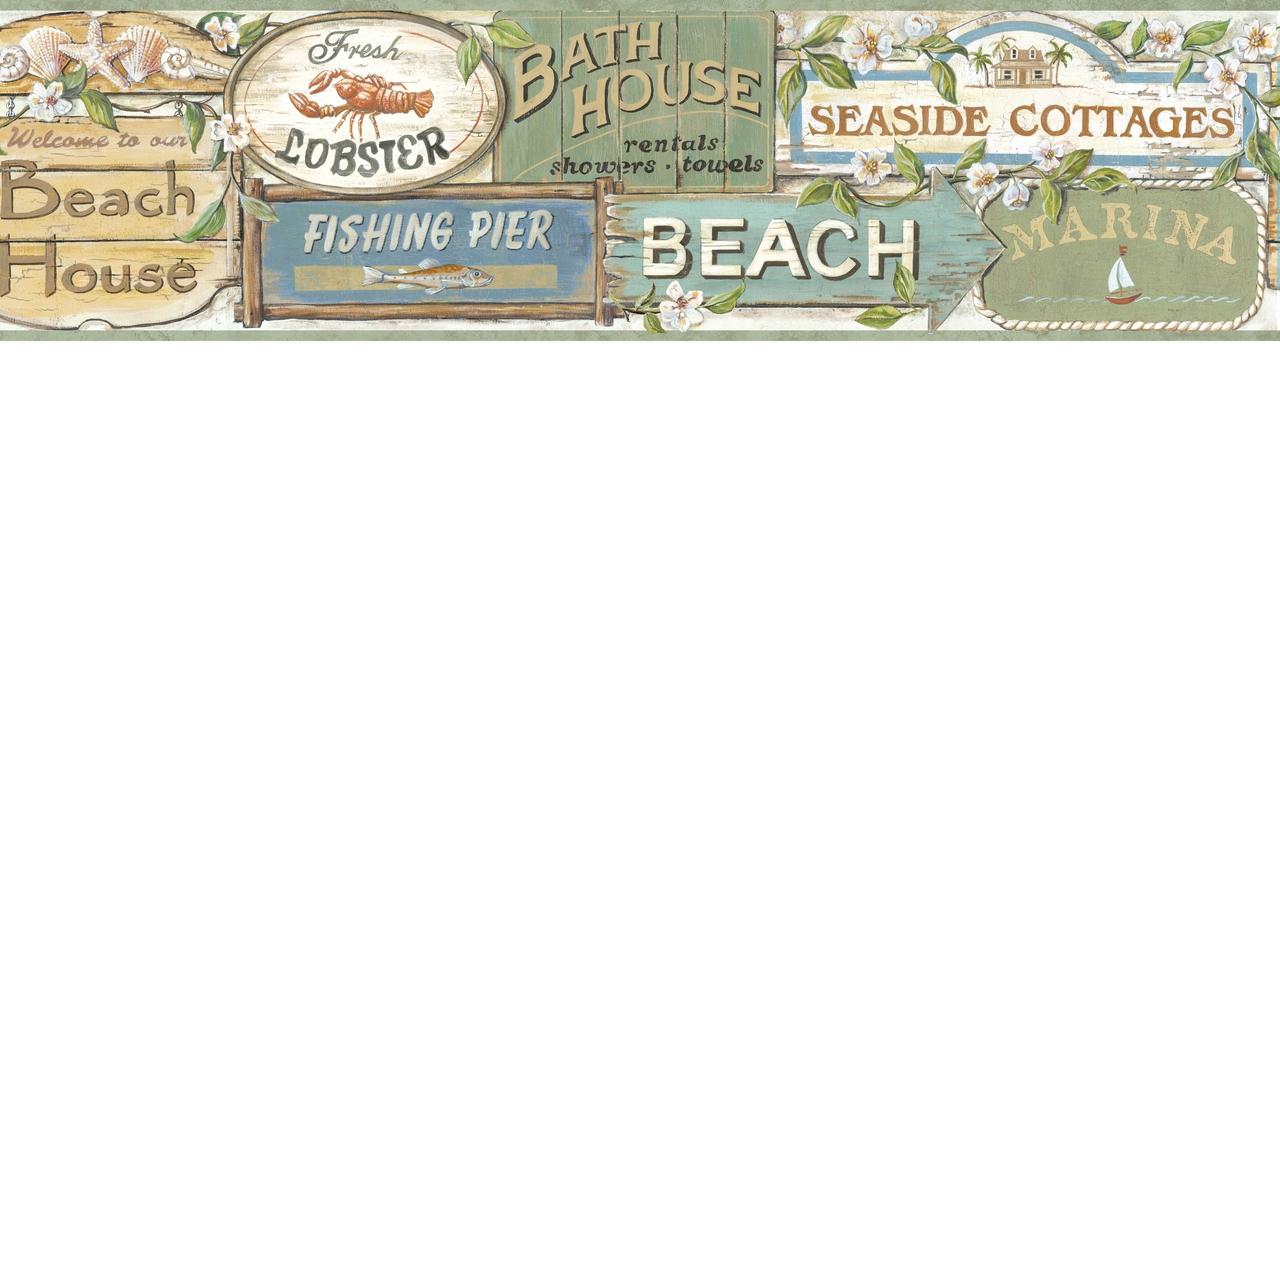 Borders by Chesapeake Seaside Beach Signs Wallpaper Border BBC46023B 1280x1280